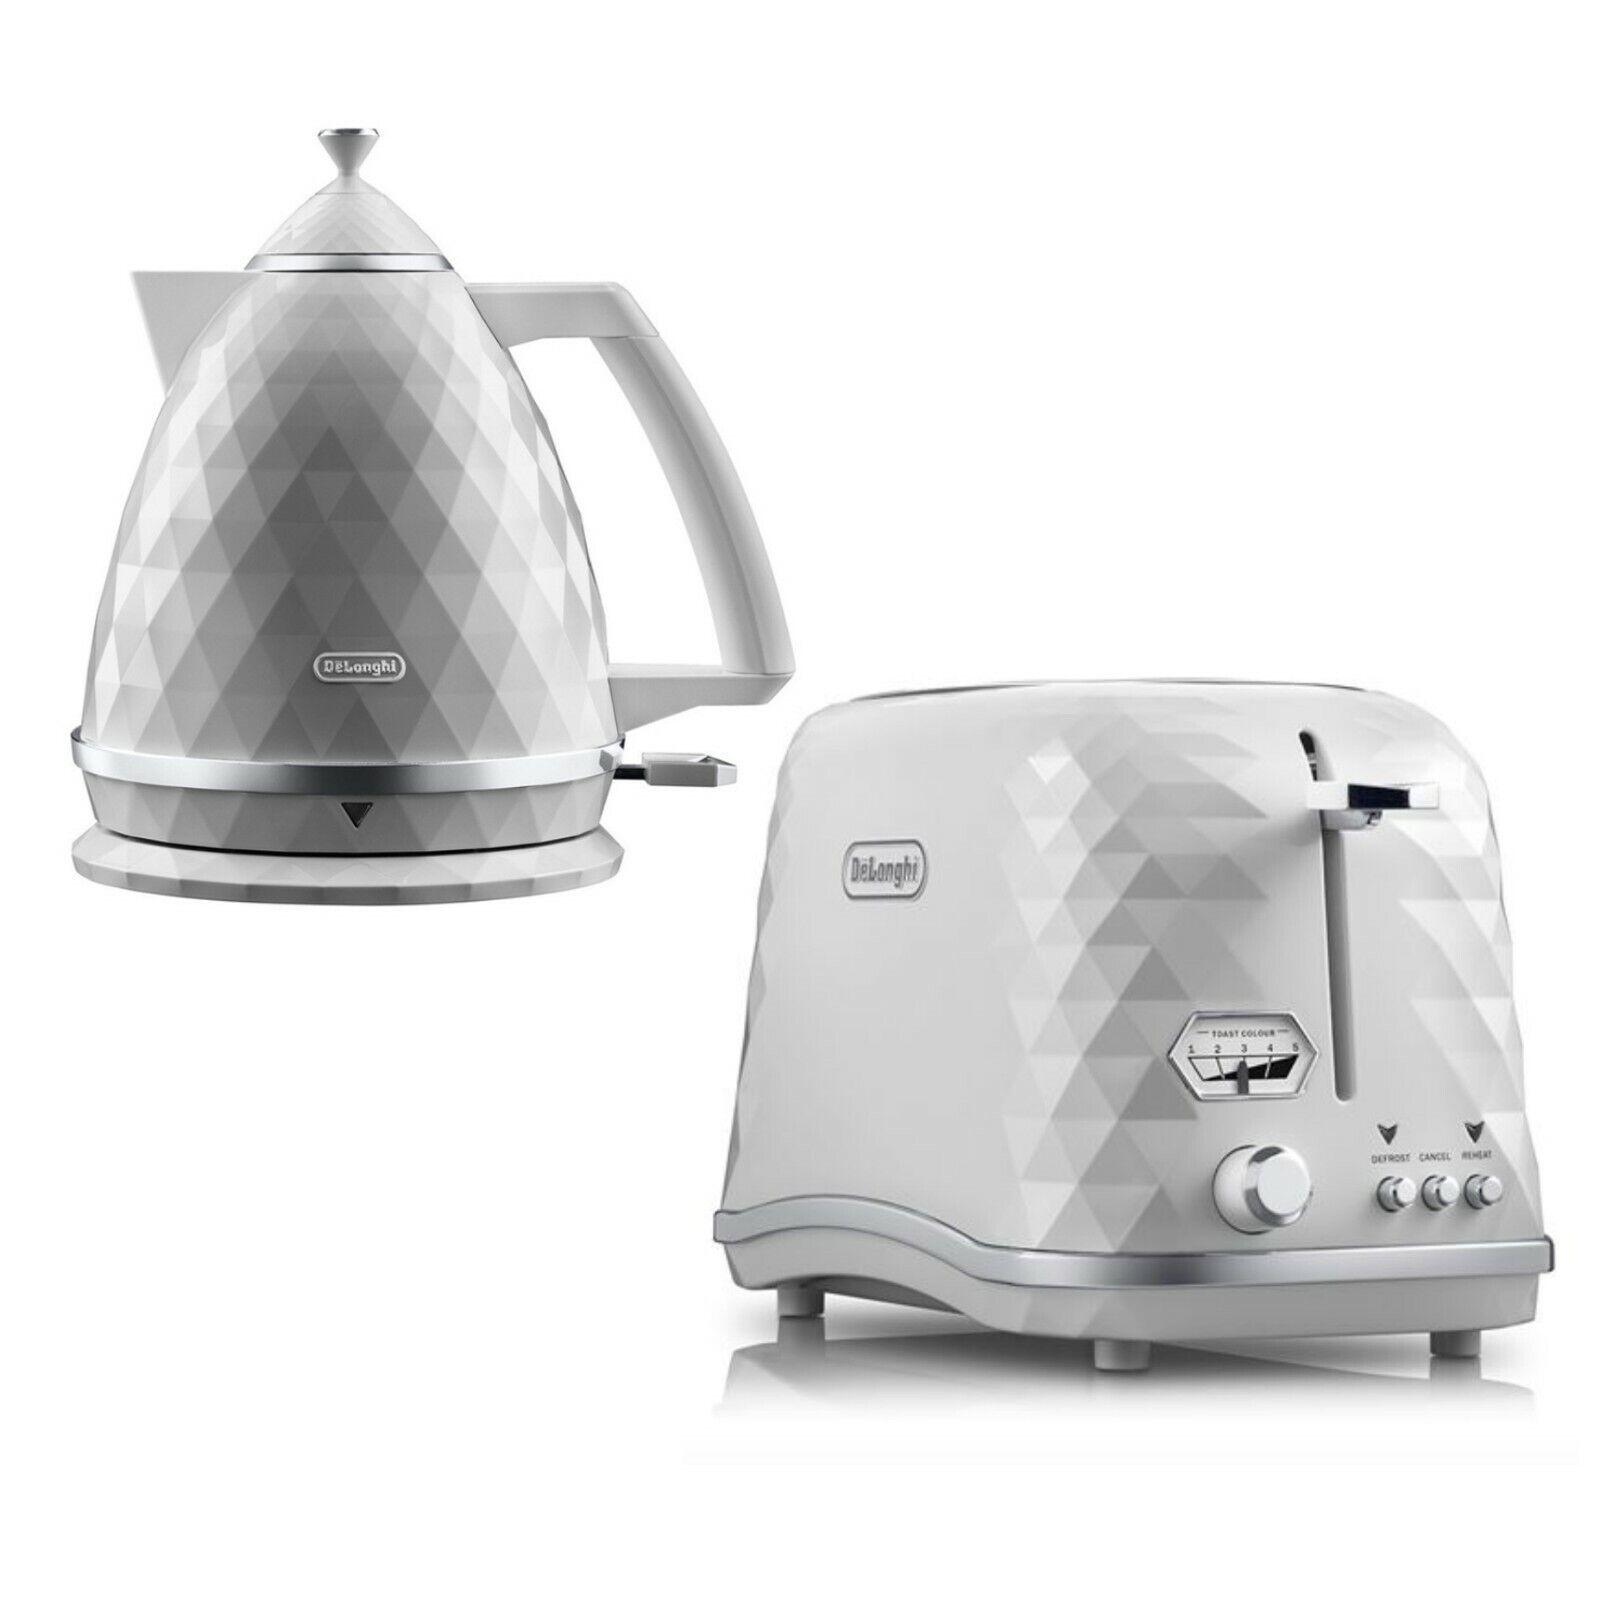 Delonghi Brilliante Exclusive Kettle + 2-Slice Toaster Set - blanc - Brand New